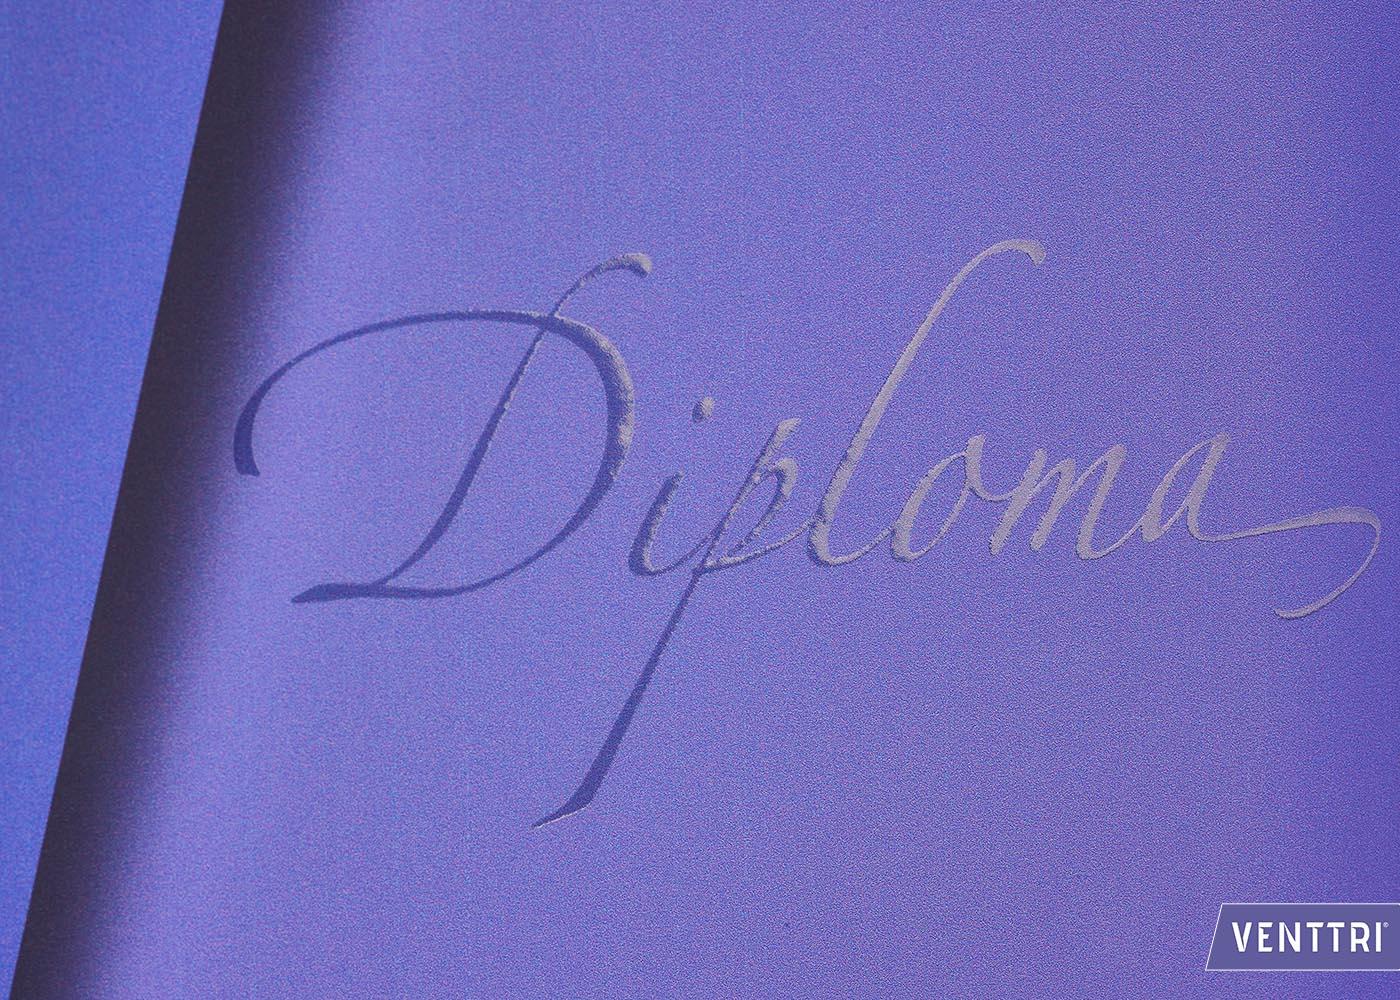 Luxe Diplomamap spot UV